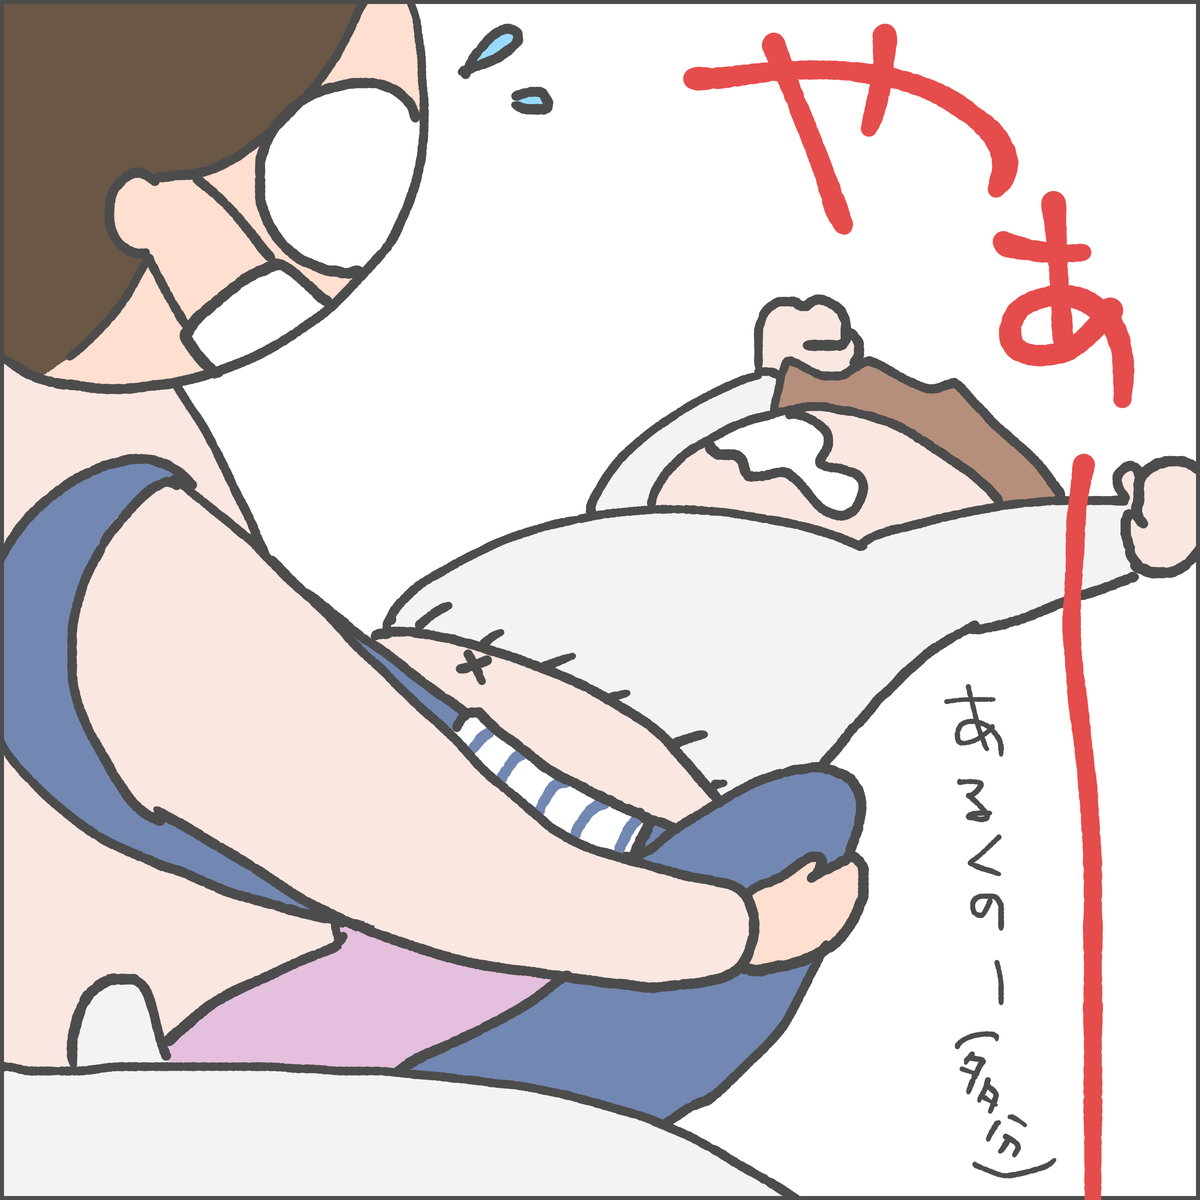 f:id:ika_yoshi:20210429032958j:plain